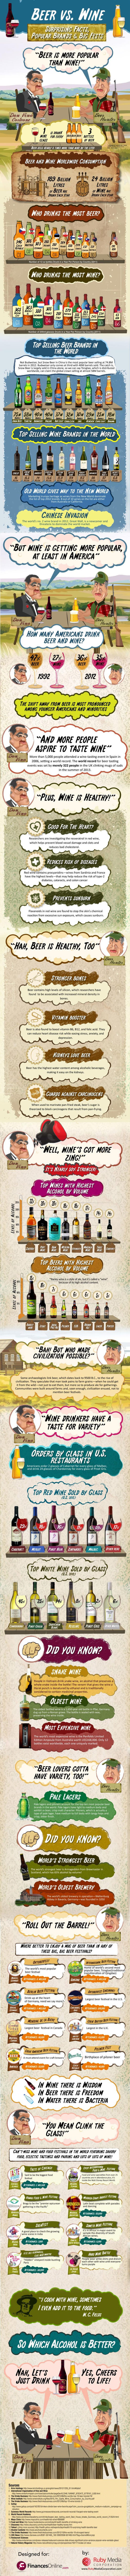 18. Wine Vs Beer